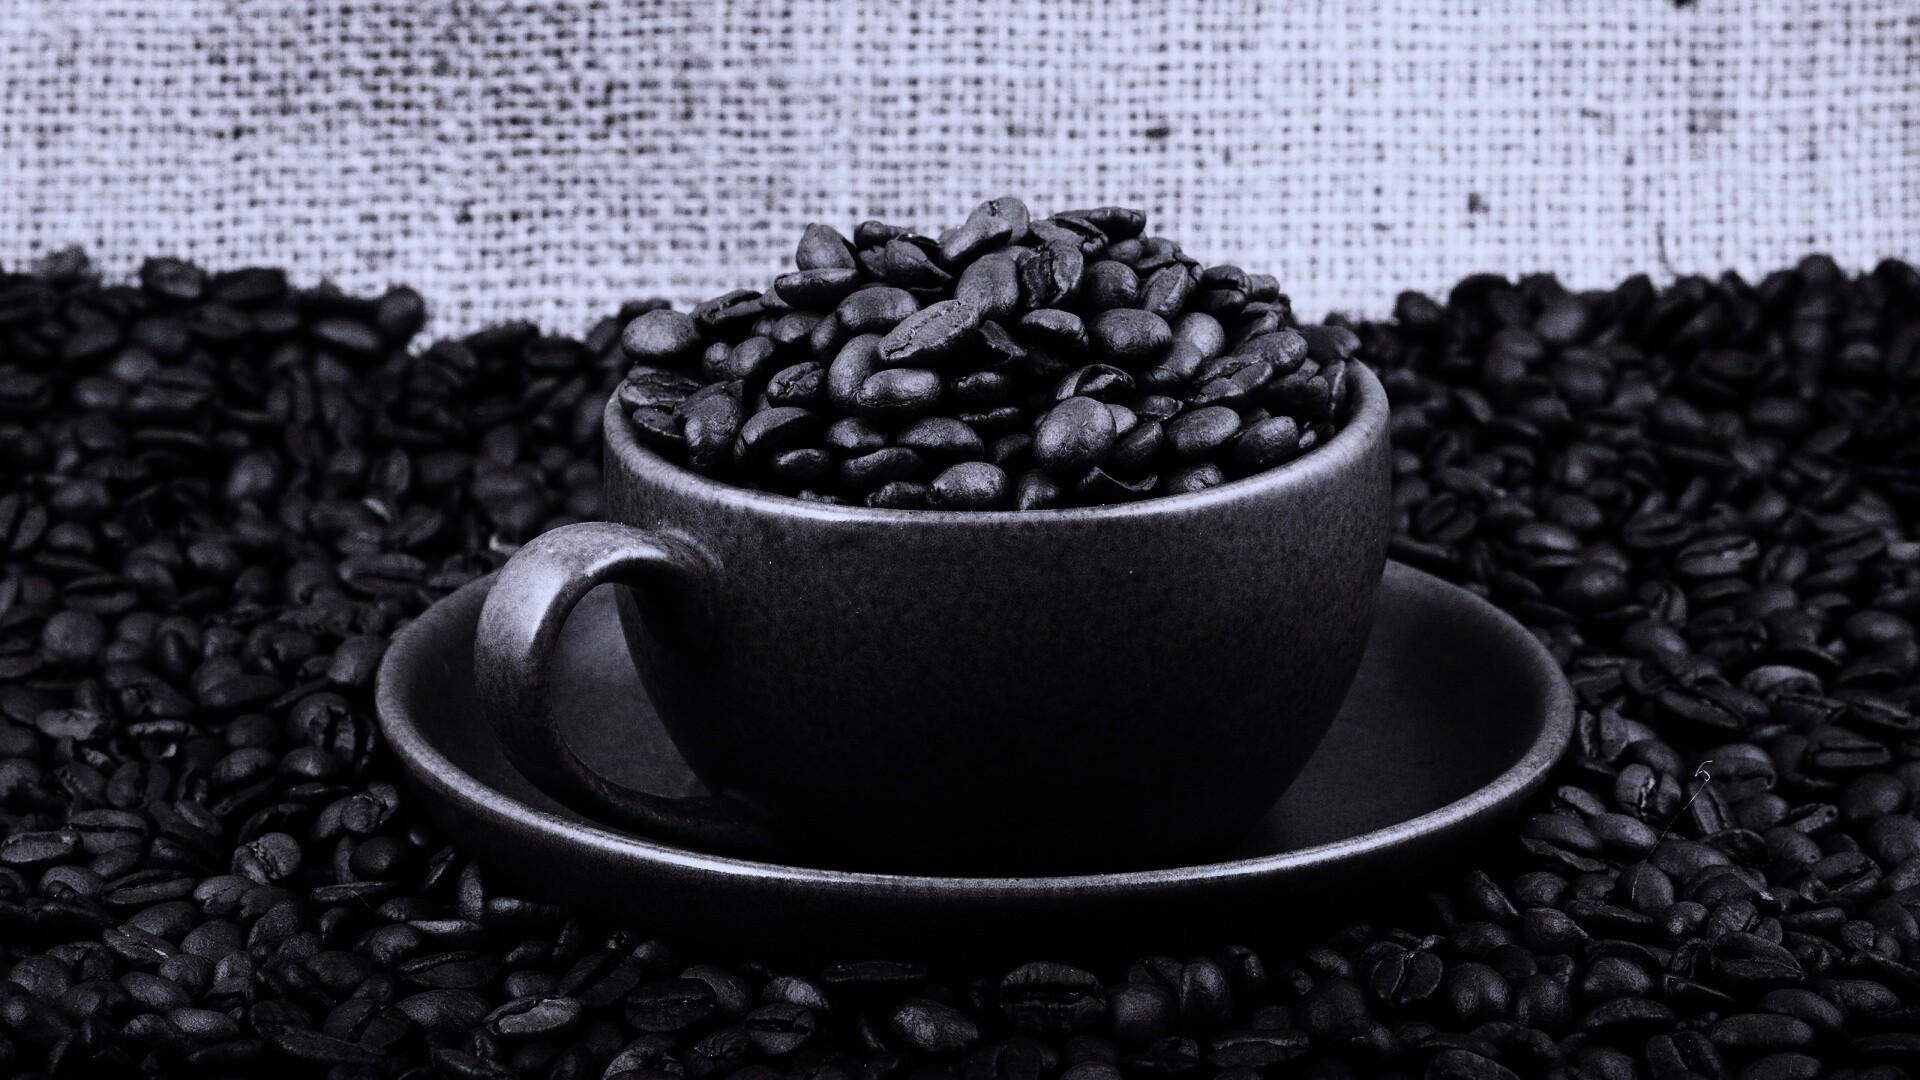 Кофеин болезни Альцгеймера – не «товарищ»